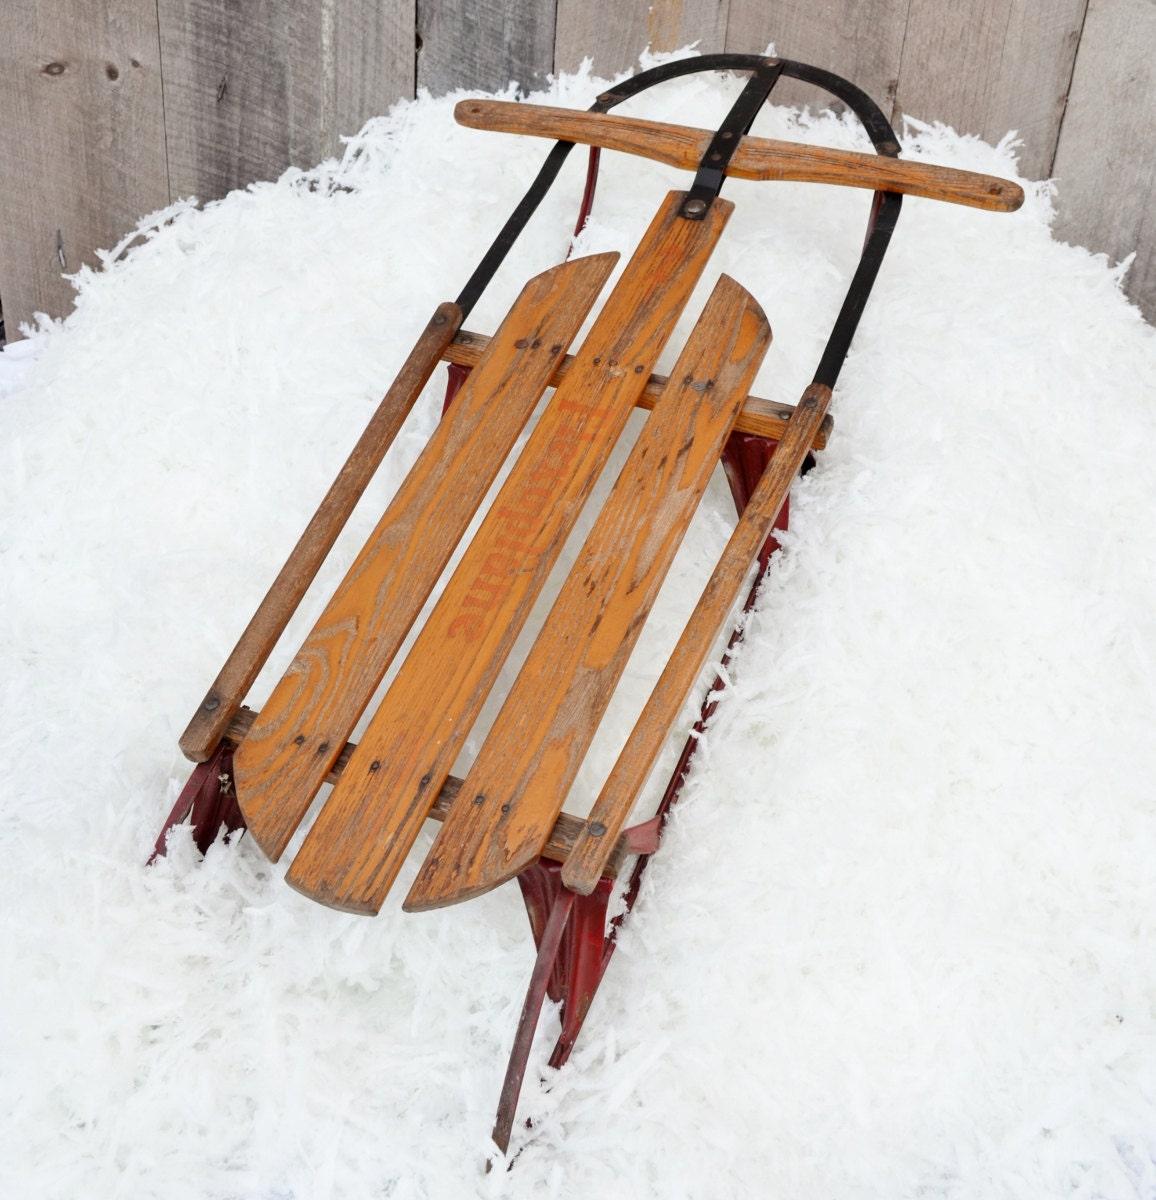 wooden plane craft with Flexoplane Snow Sled Winter Wooden on Antique English Plough Plane Gp together with Aluminium Ski Boat Plans further NDMwODZmNWLmiLflpJbmiYvlt6XnjqnlhbfliLbkvZwBNDAwATQwMAFpbWFnZTQuc3VuaW5nLmNuL2NvbnRlbnQvY2F0ZW50cmllcy8wMDAwMDAwMDAxMDU2Mi8wMDAwMDAwMDAxMDU2MjA5MjMvZnVsbGltYWdlLzAwMDAwMDAwMDEwNTYyMDkyM18xLm ZwHmiYvlt6XliLbkvZwg5b2p57uY546p5YW3 as well Flexoplane Snow Sled Winter Wooden additionally Duct Tape Diy Projects.